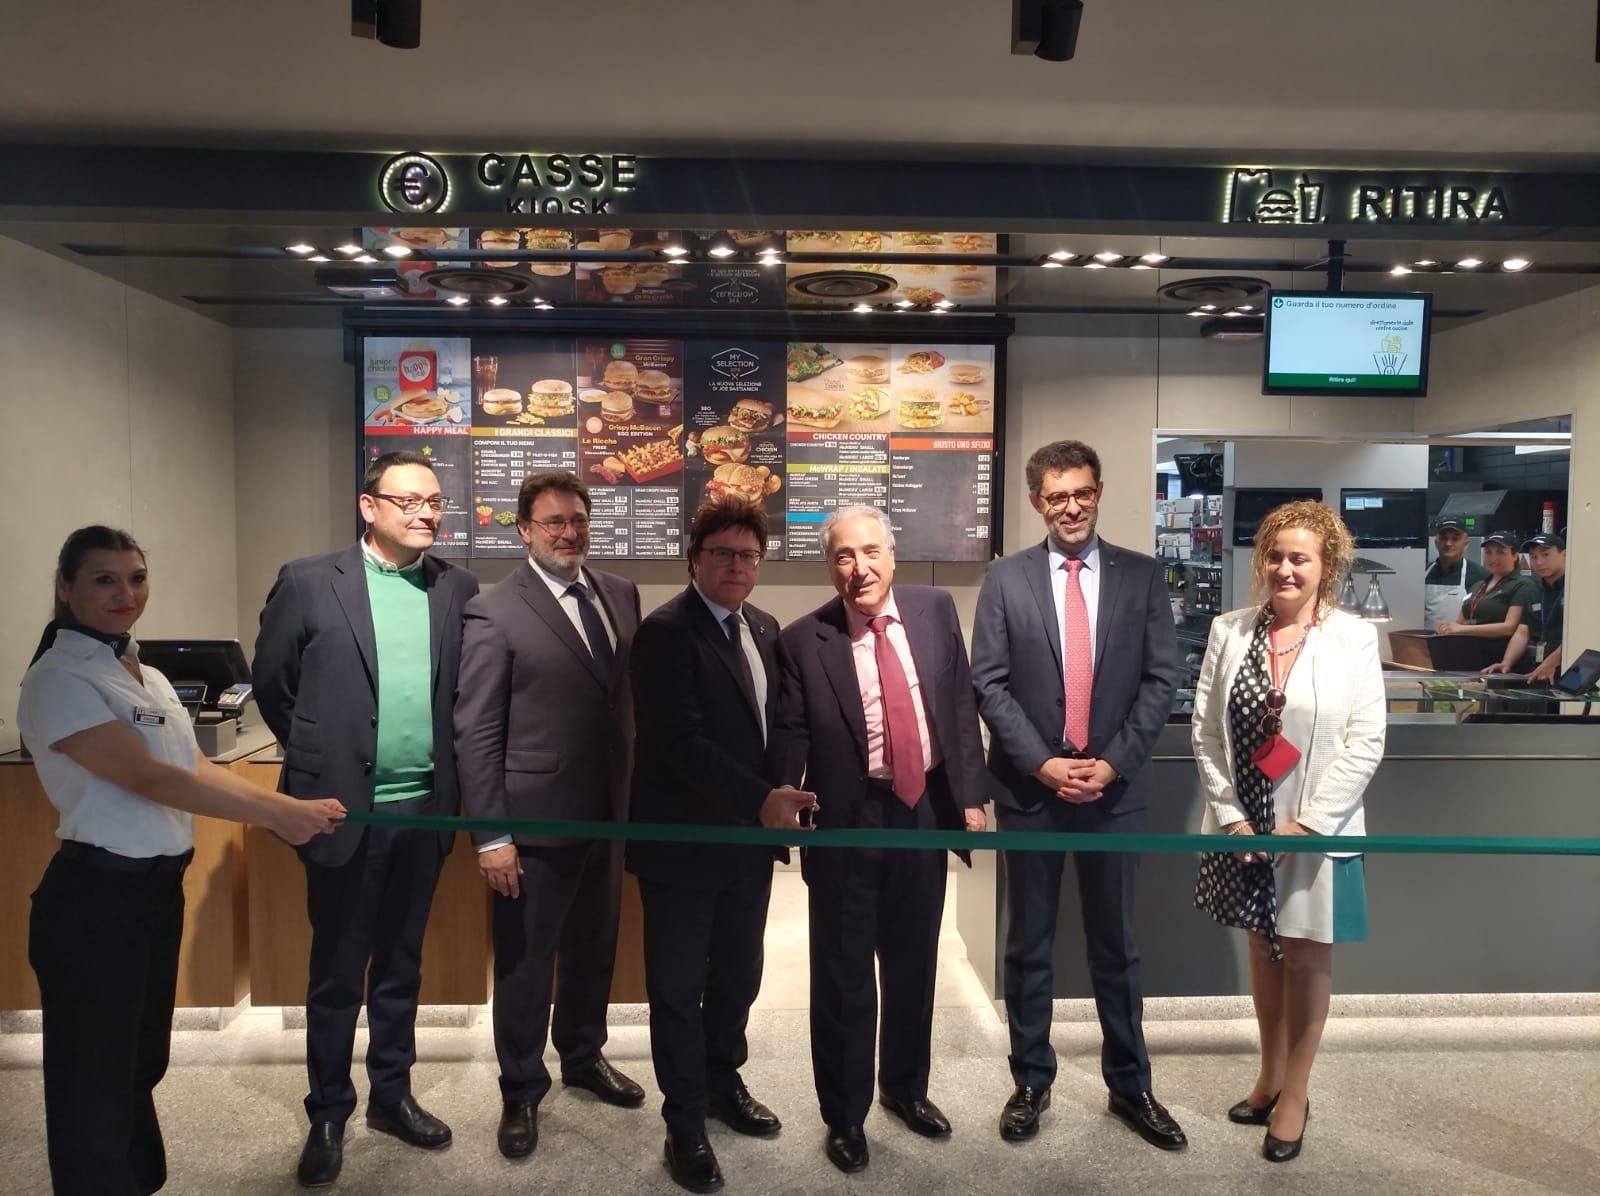 Taglio del nastro per l'apertura del McDonald's a Fontanarossa